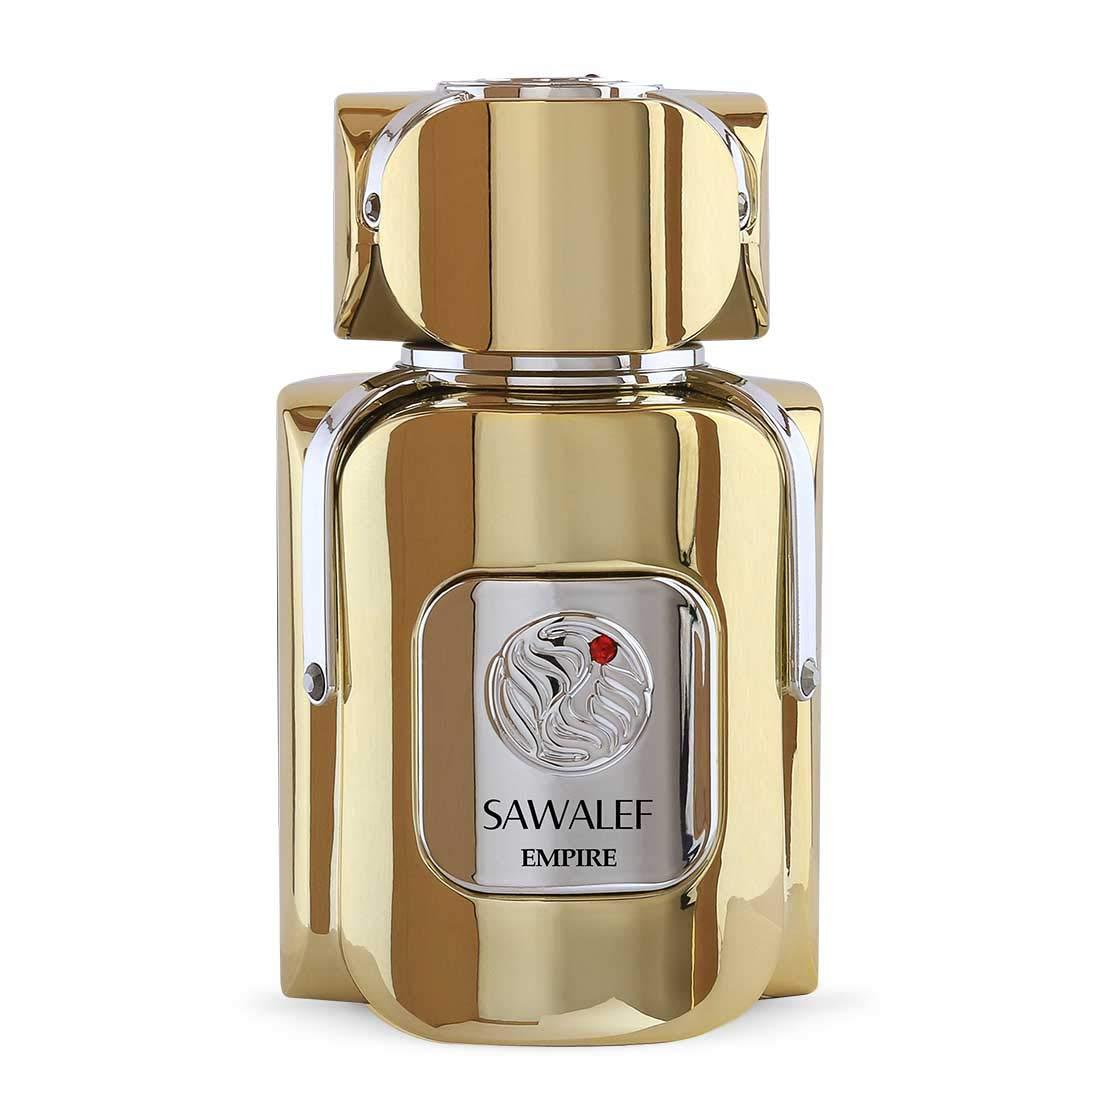 EMPIRE SAWALEF Botique Range